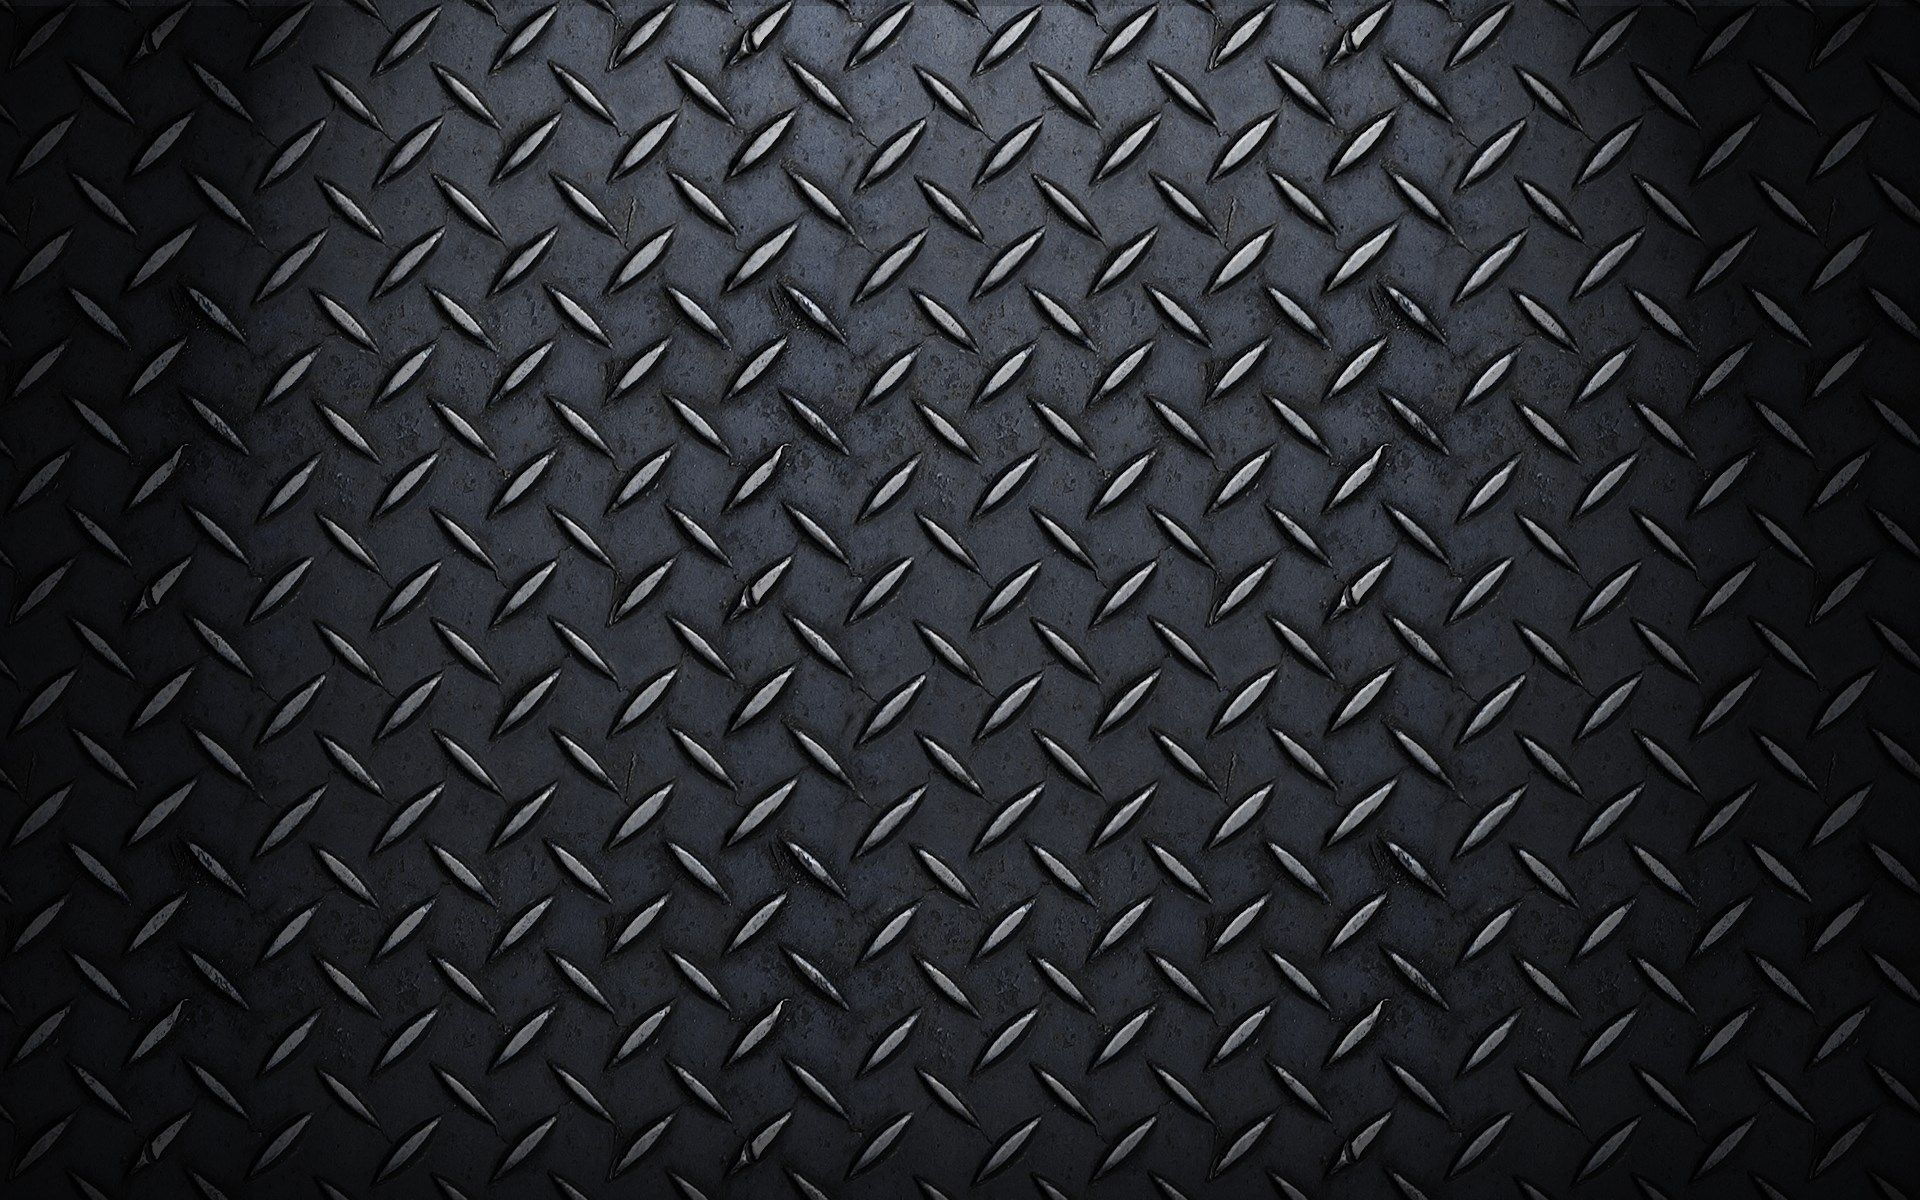 Free Digital Metal Wallpaper Hd テクスチャ デザイン 藝術